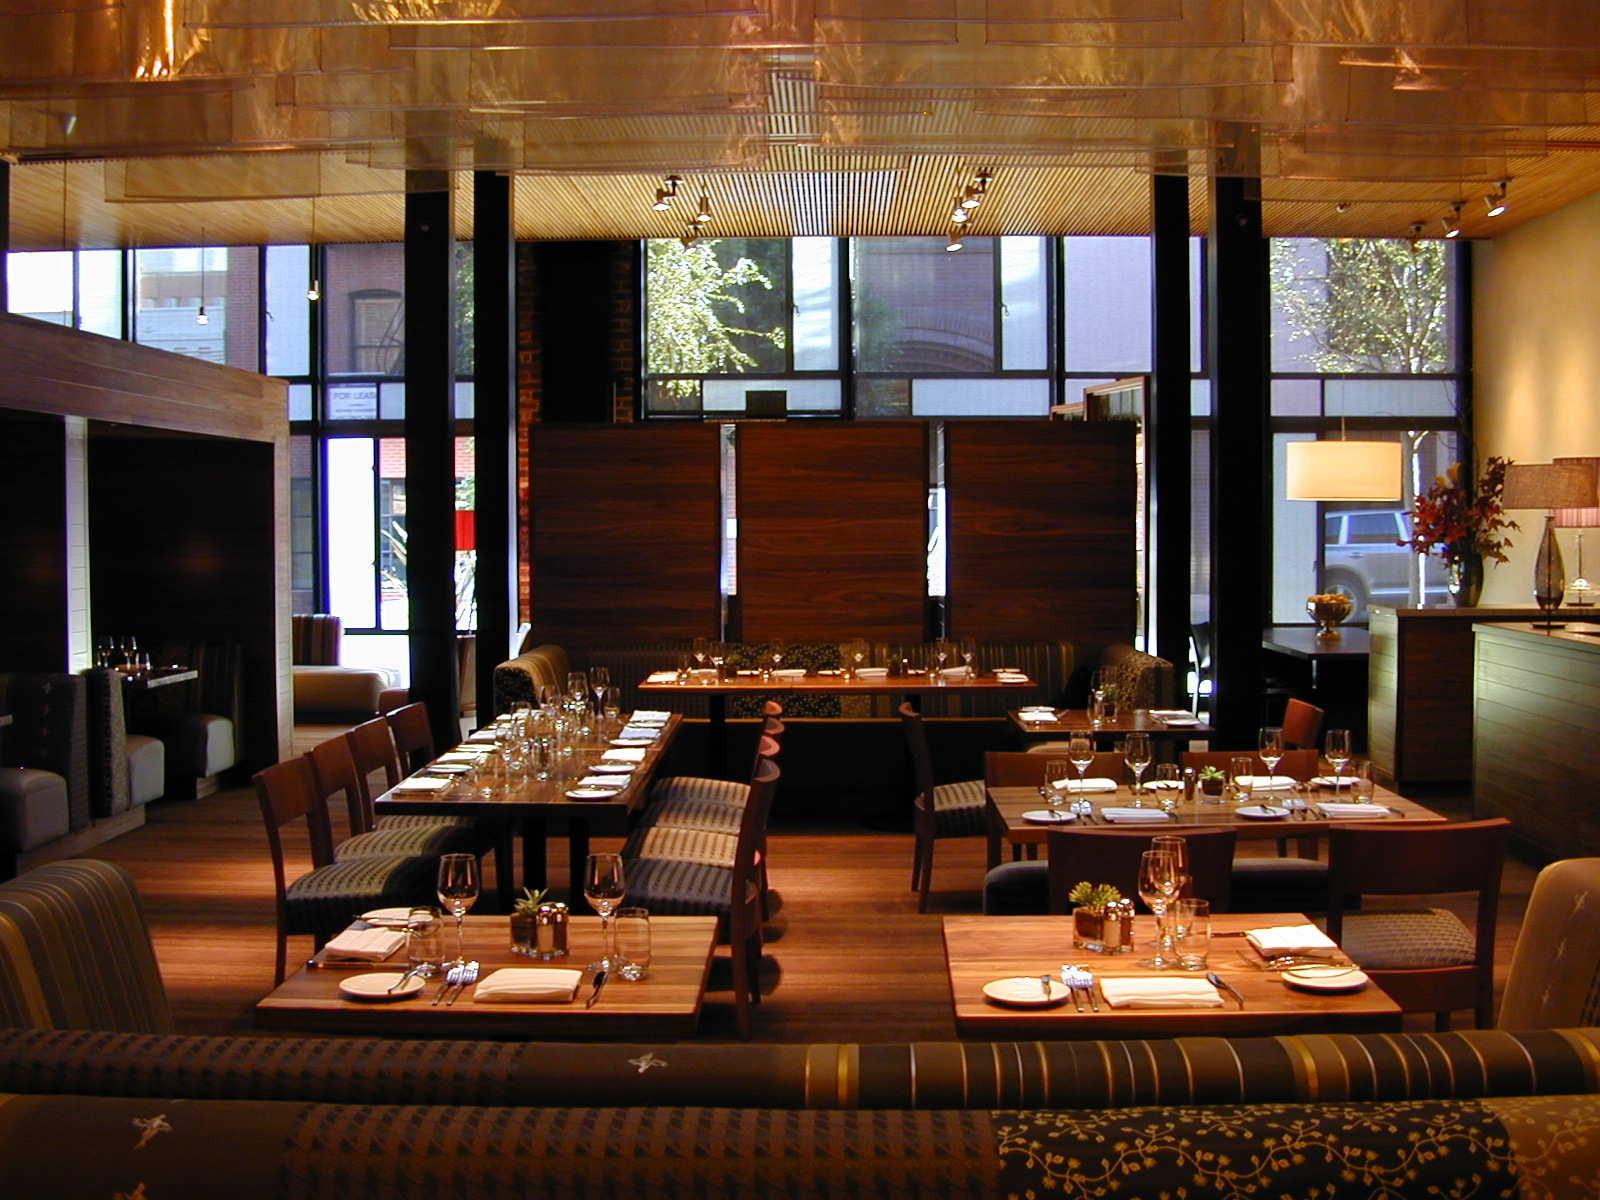 Best Dinner In San Francisco  San Francisco Fine Dining Five Star Restaurants in San